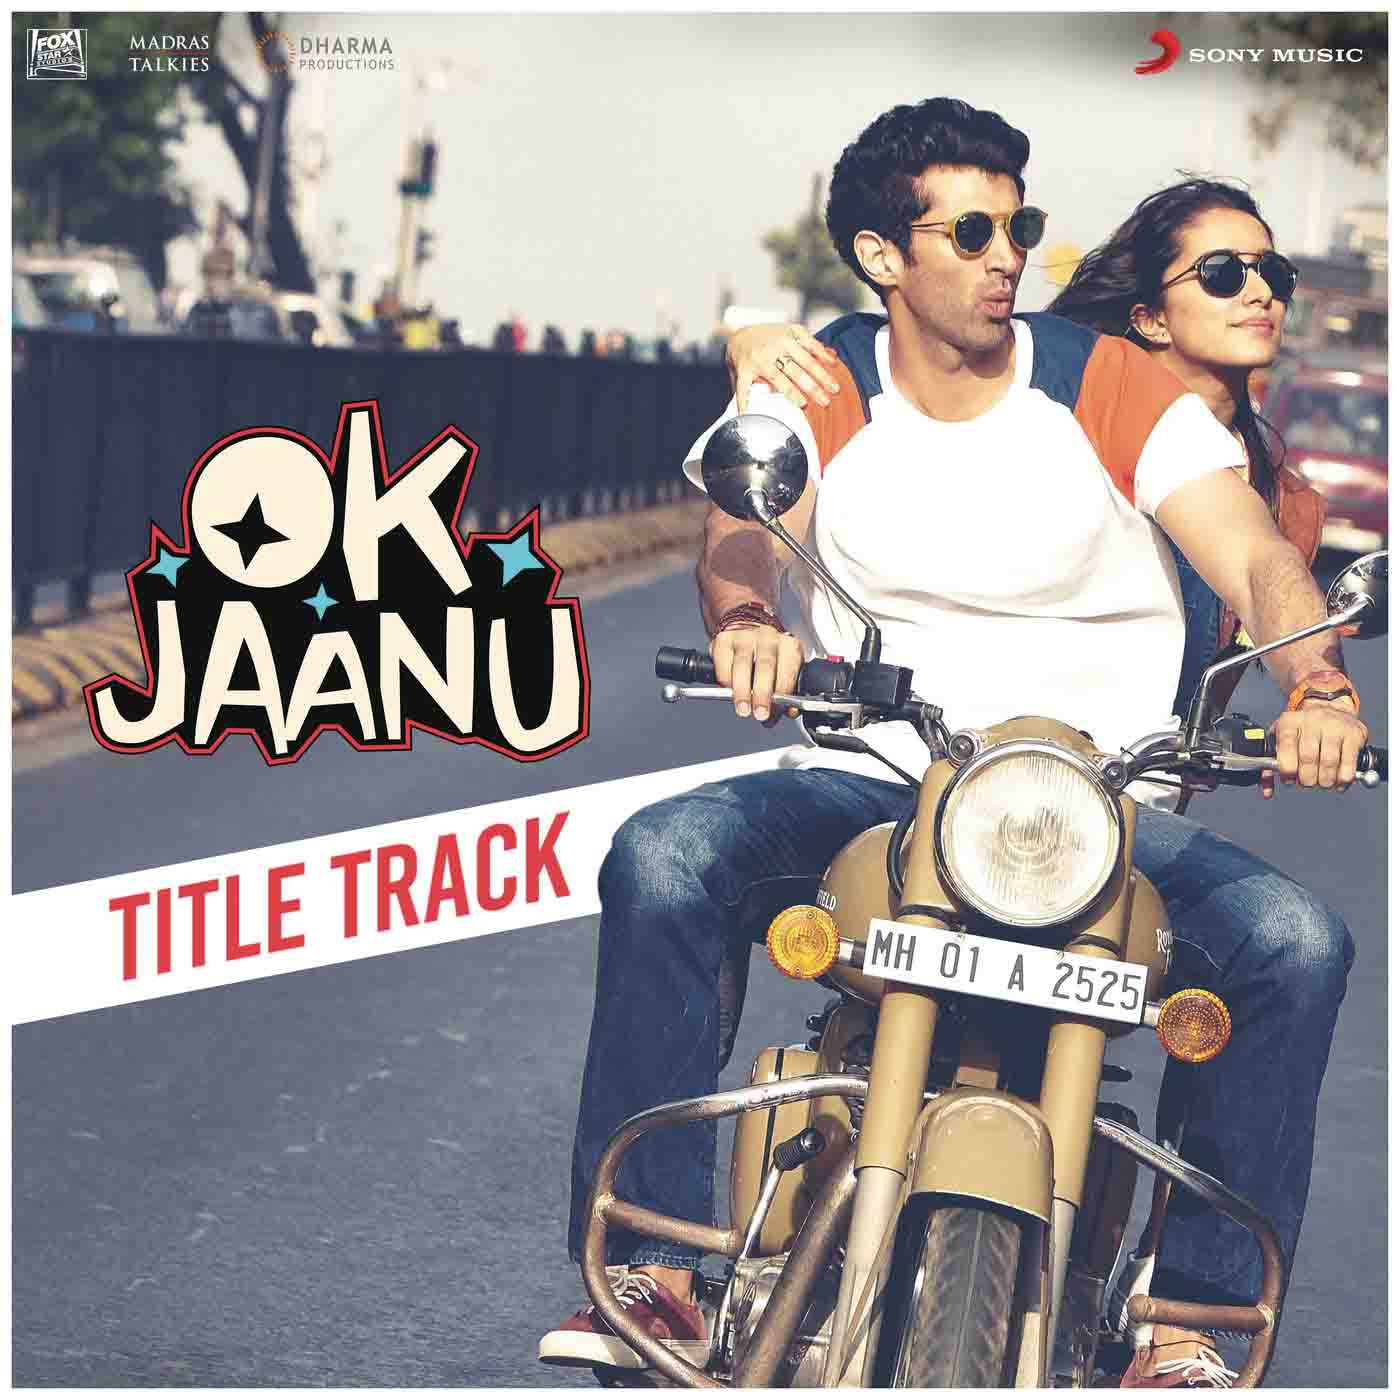 OK Jaanu – Watch Movie at Carnival: Amar Jyoti